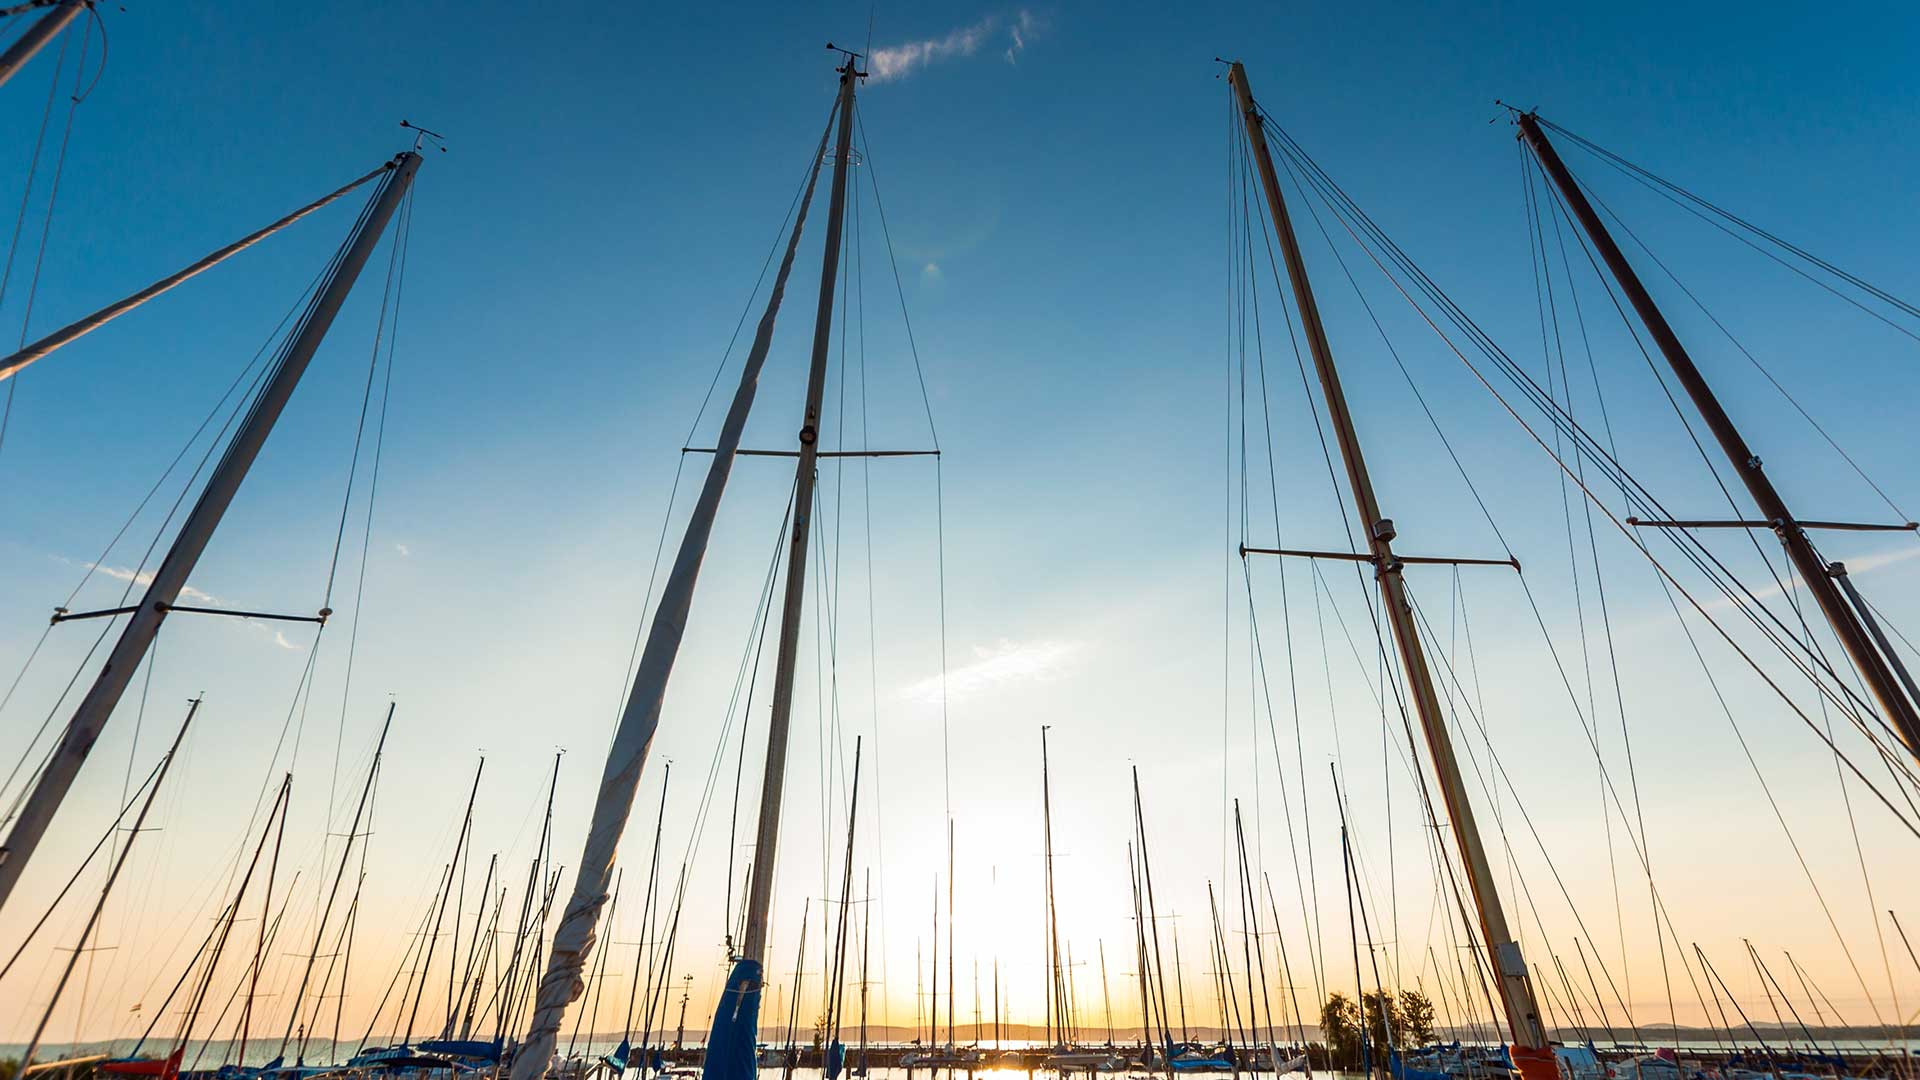 Yacht poles